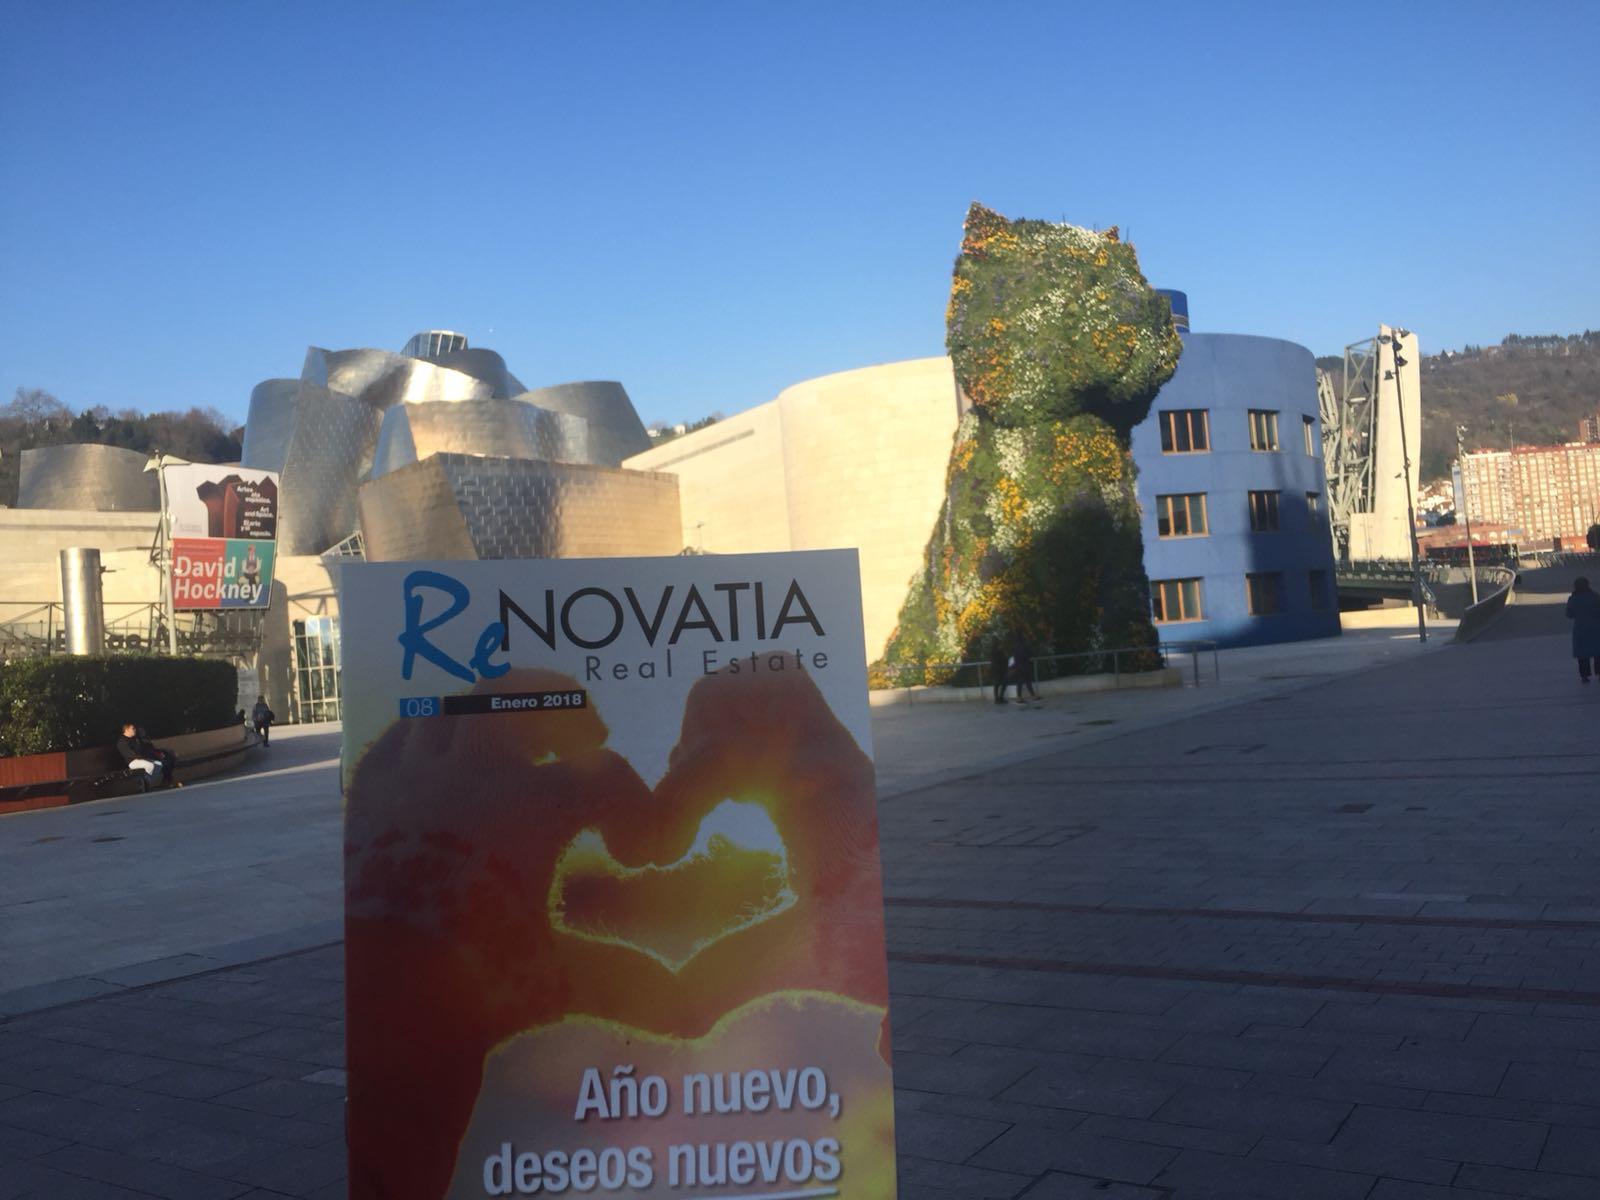 foto de folleto en Bilbao